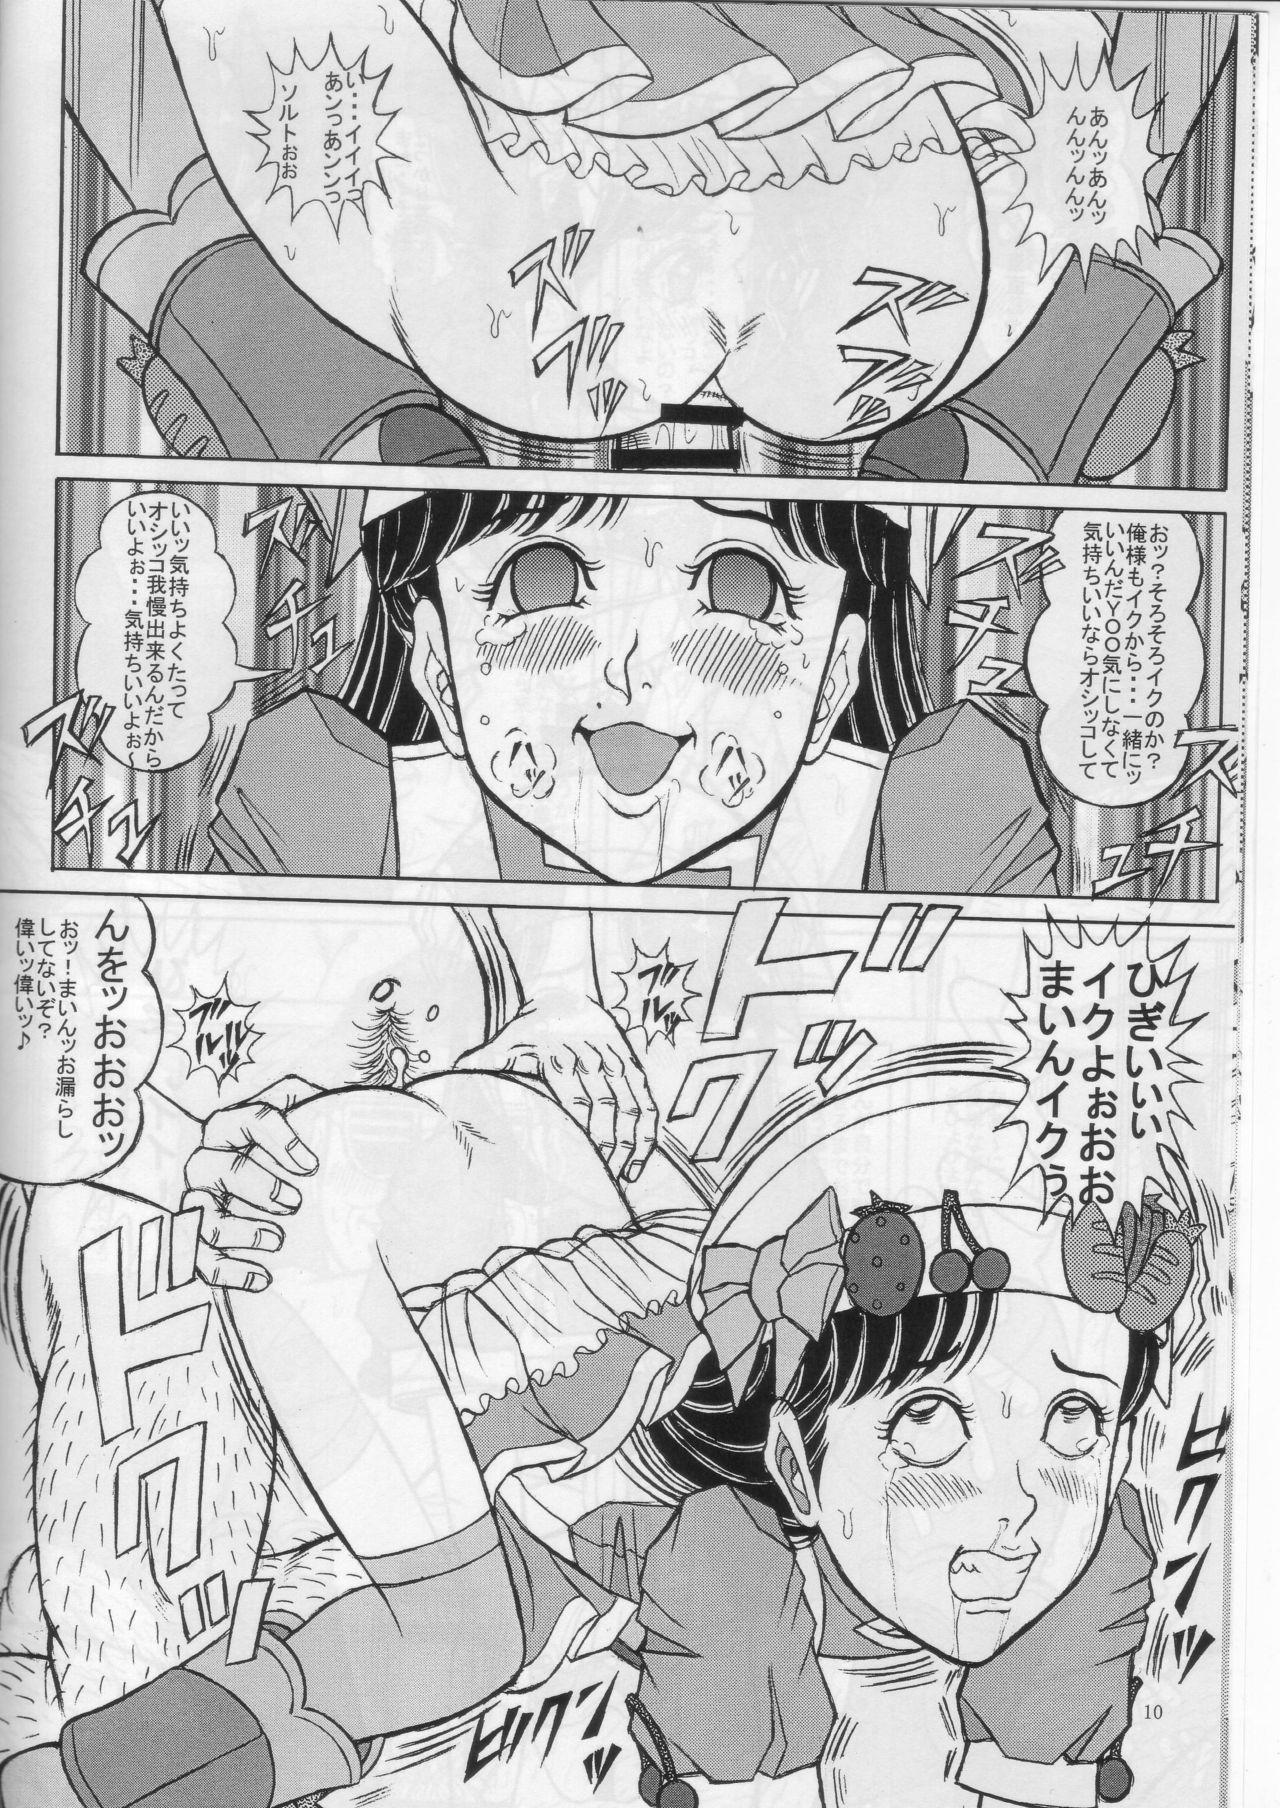 Minna de Yokumite Ara★Domo♪ Kaiseiban 8